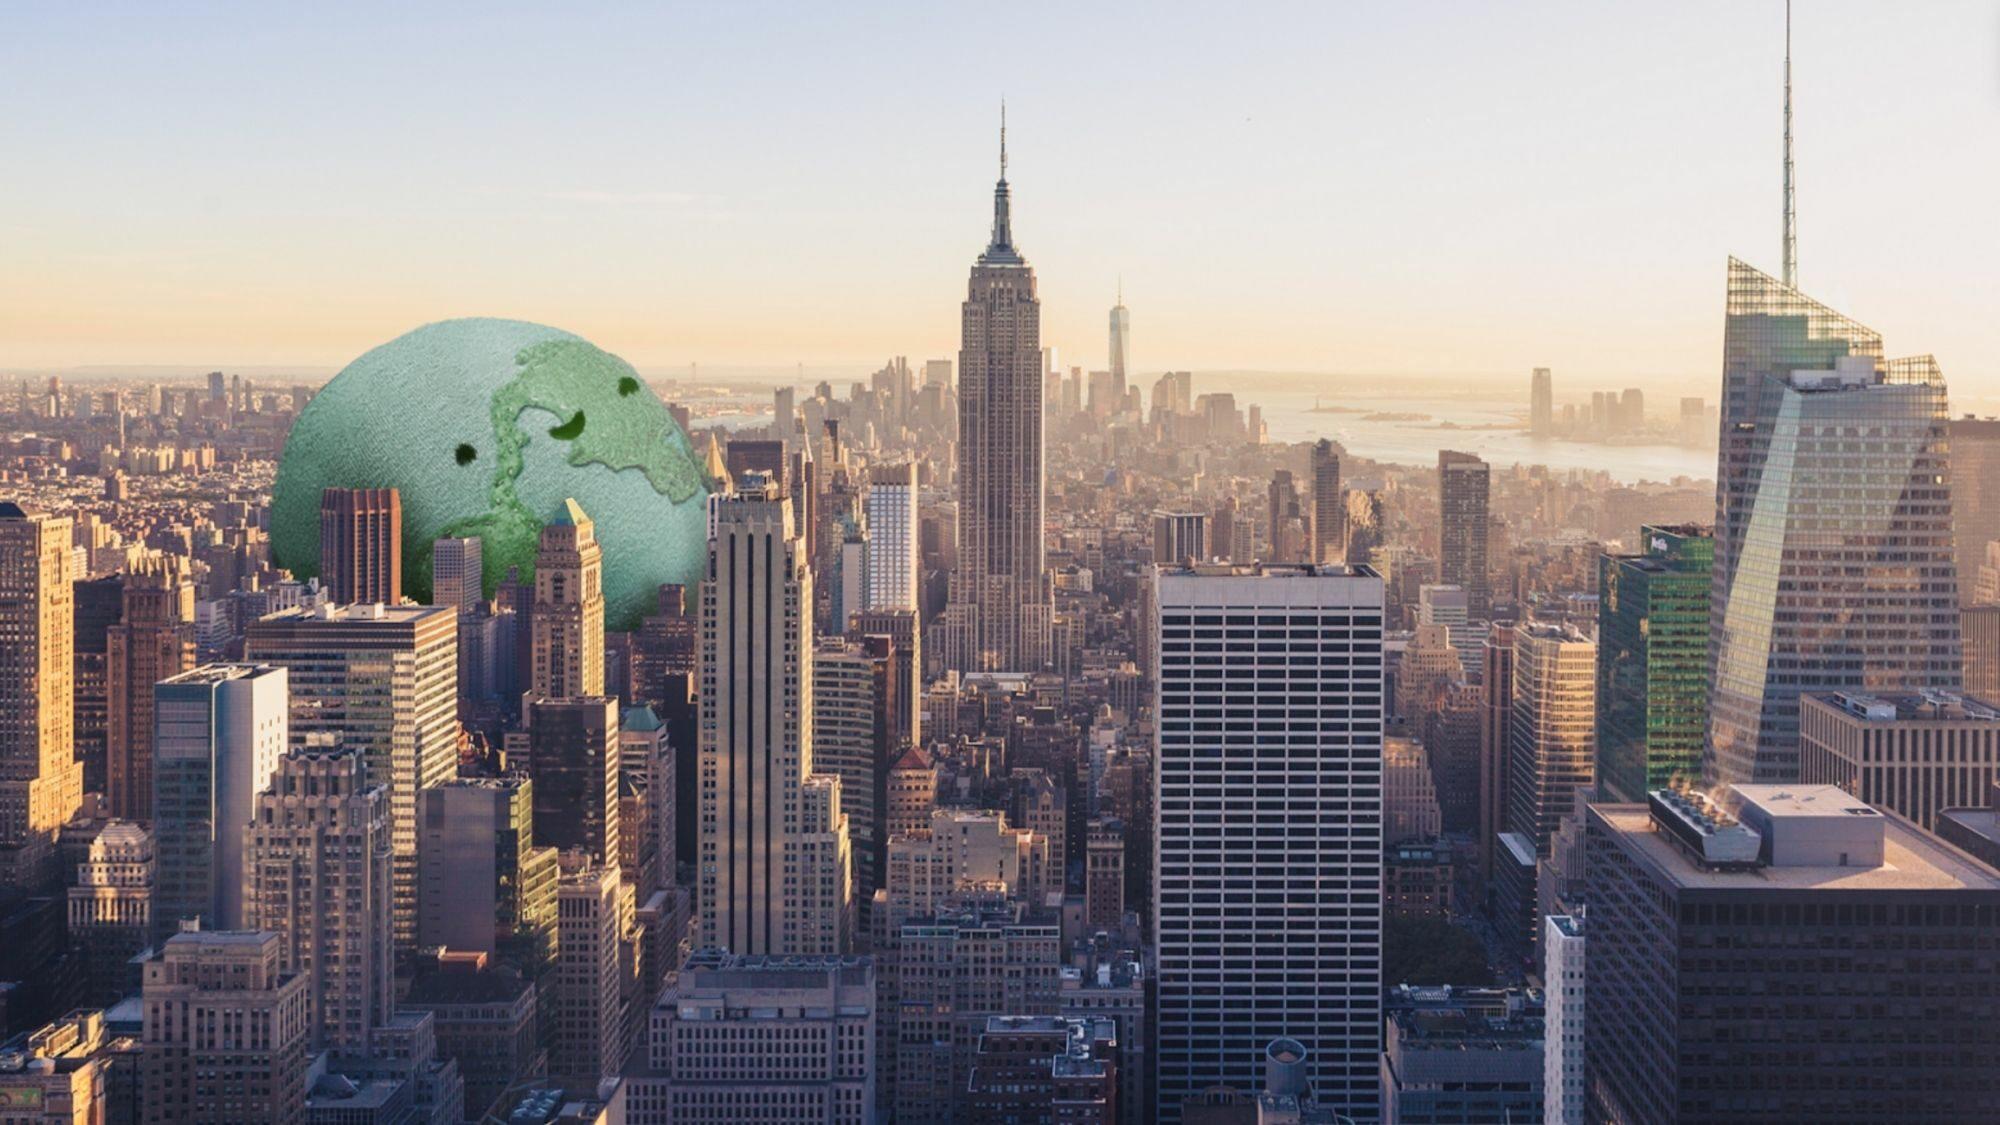 A cartoon Earth sits smiling among a city landscape